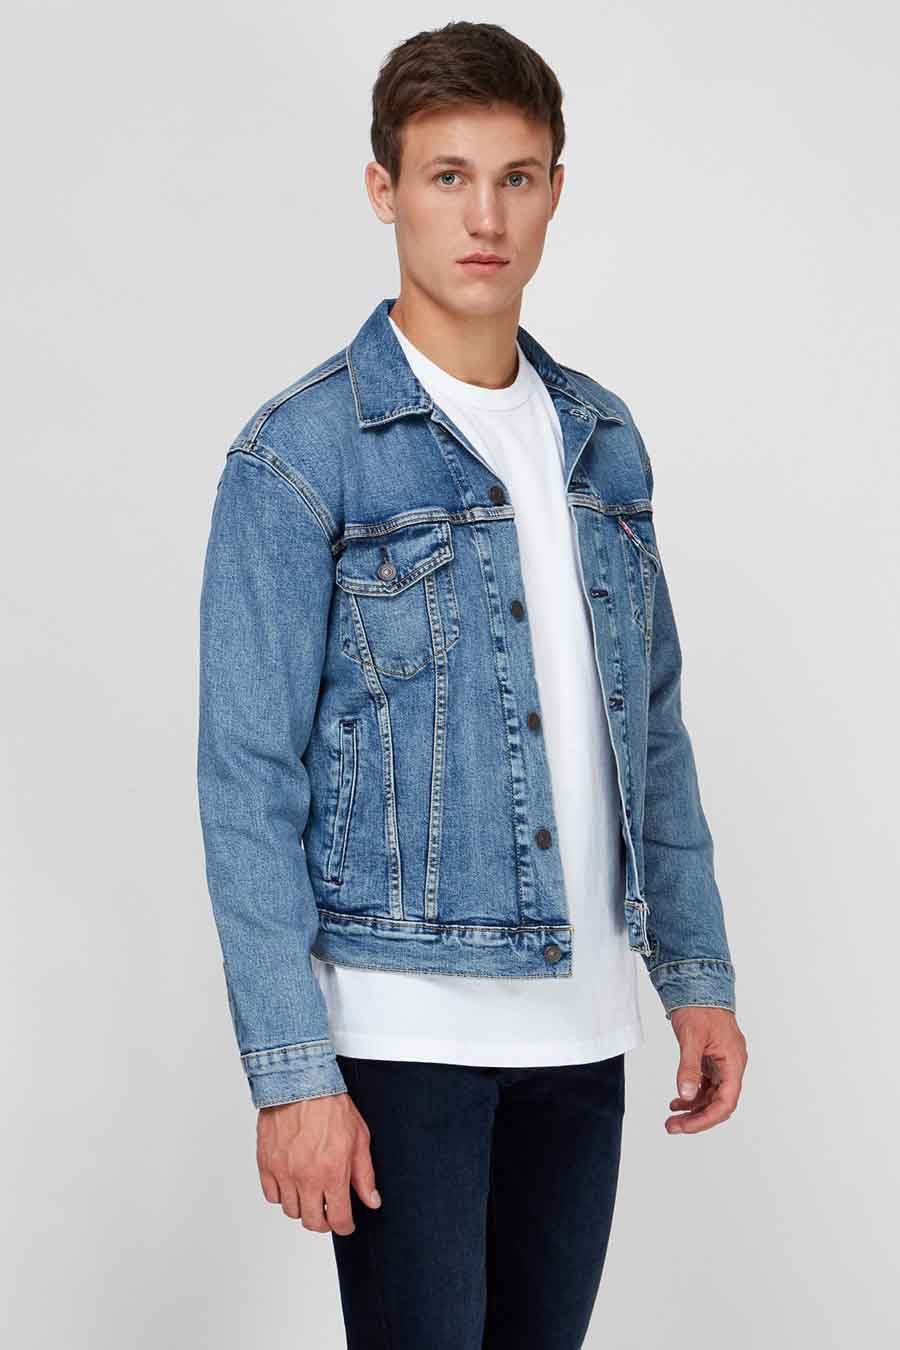 Levi's® Jas jeans, Denim, Heren, Maat: M/S/XL/XXL